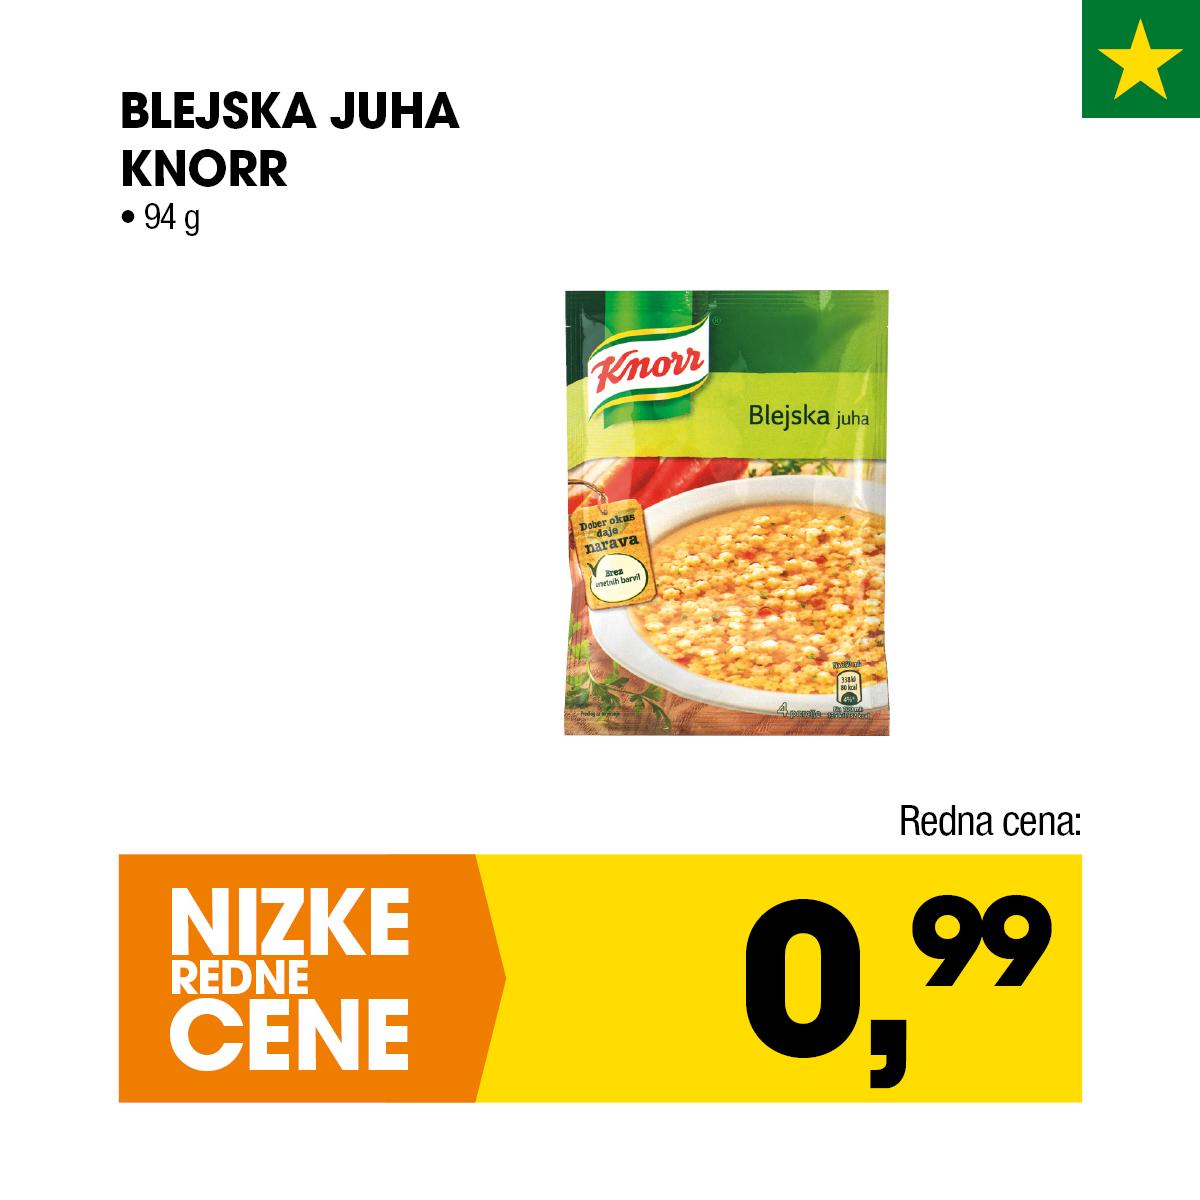 Blejska juha Knorr